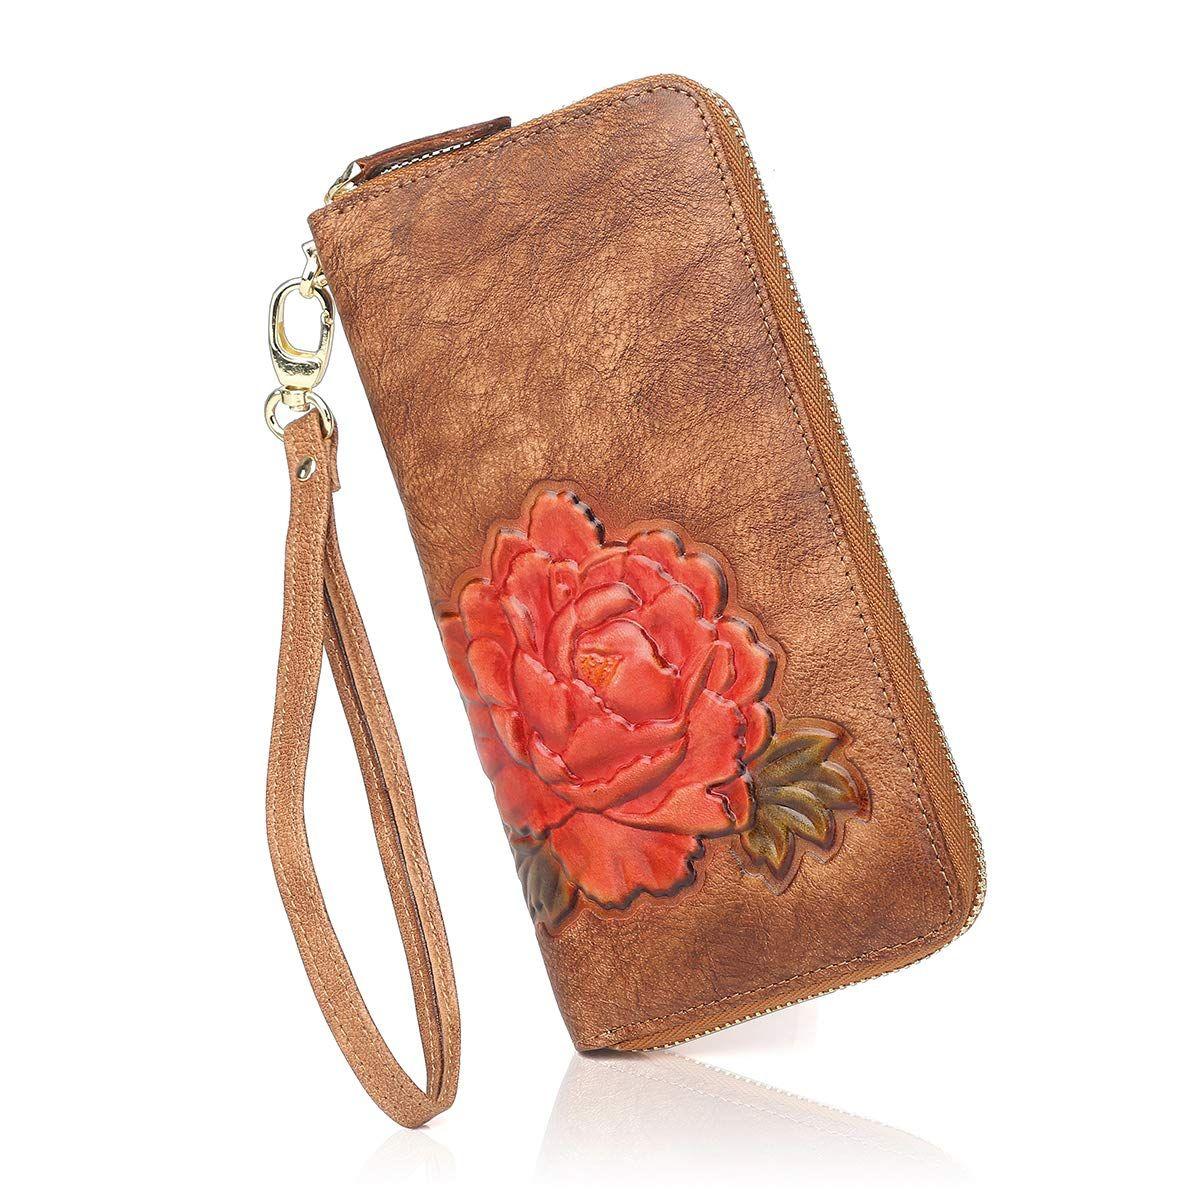 Aphison designer womens leather zipper wallets cowhide